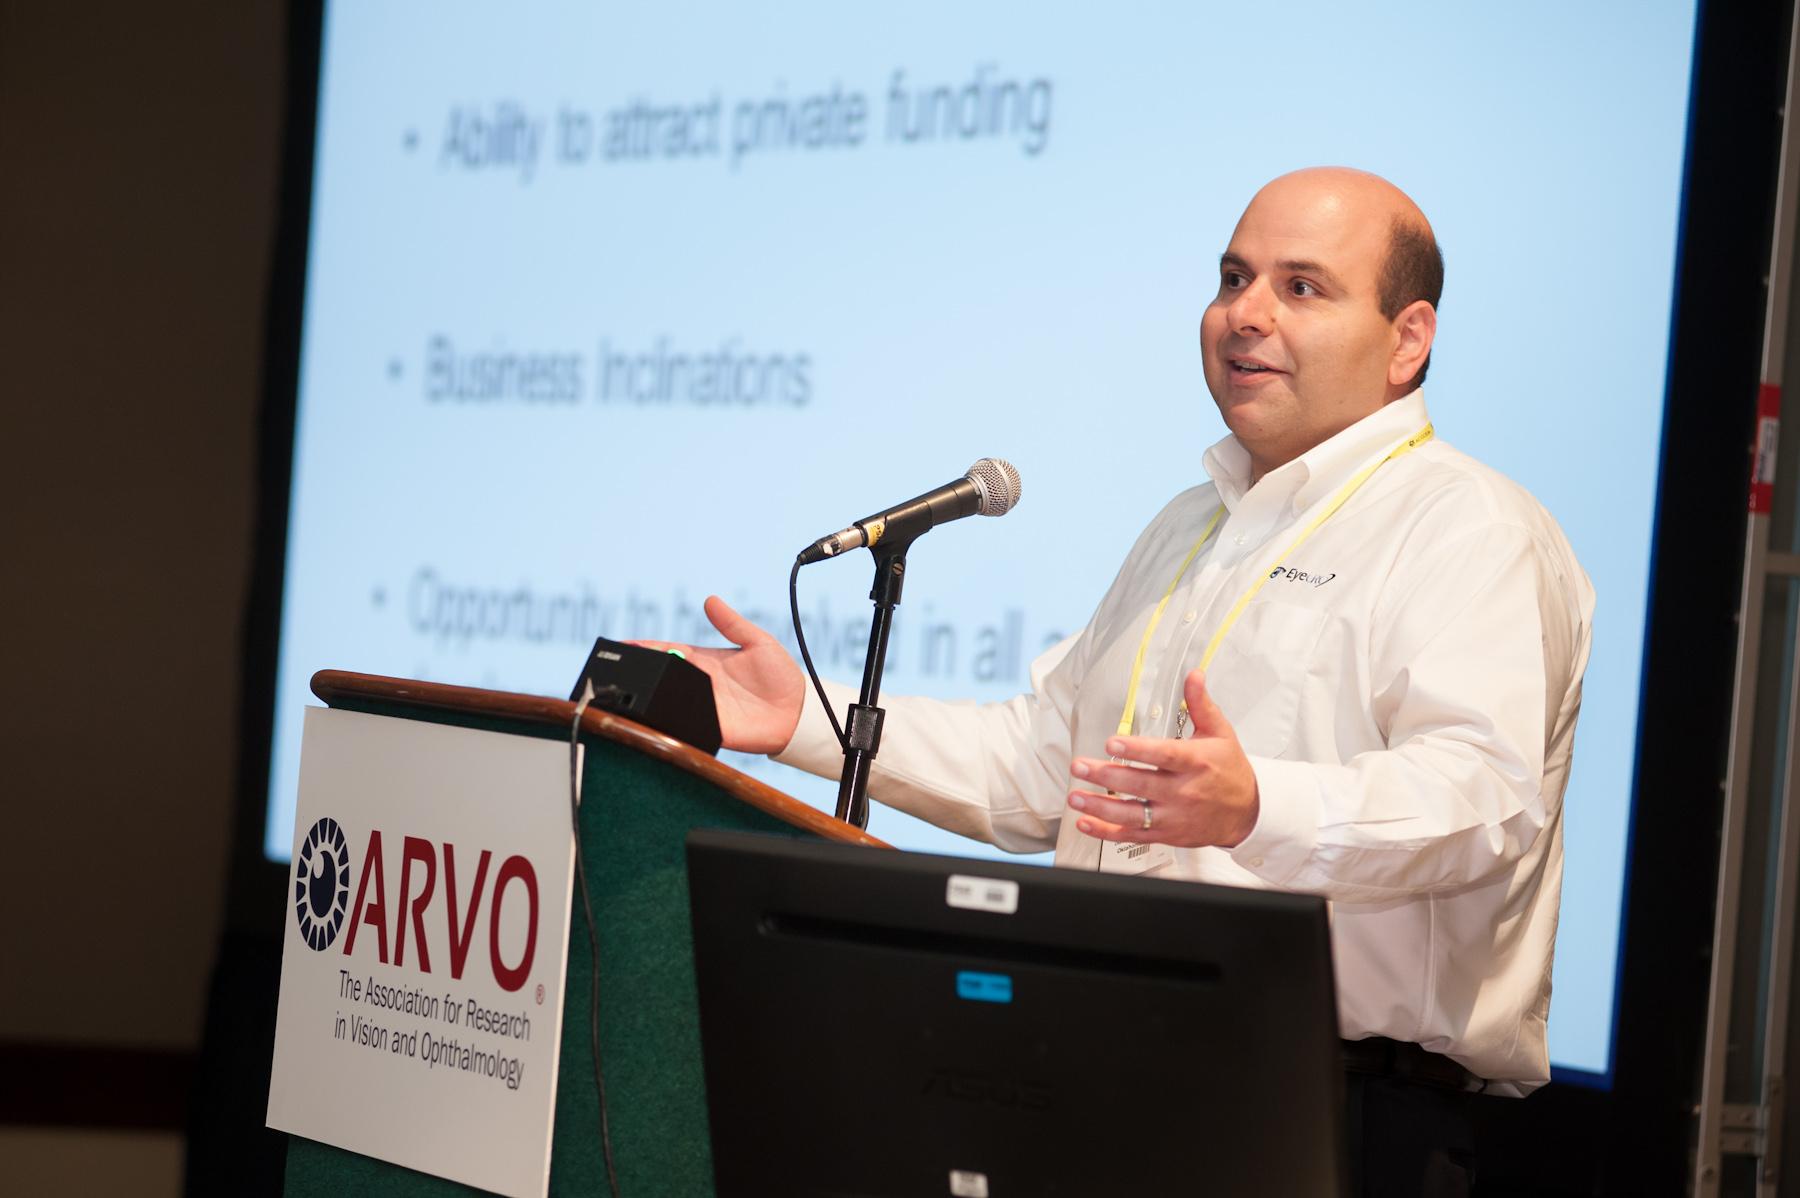 Dr. Rafal Farjo